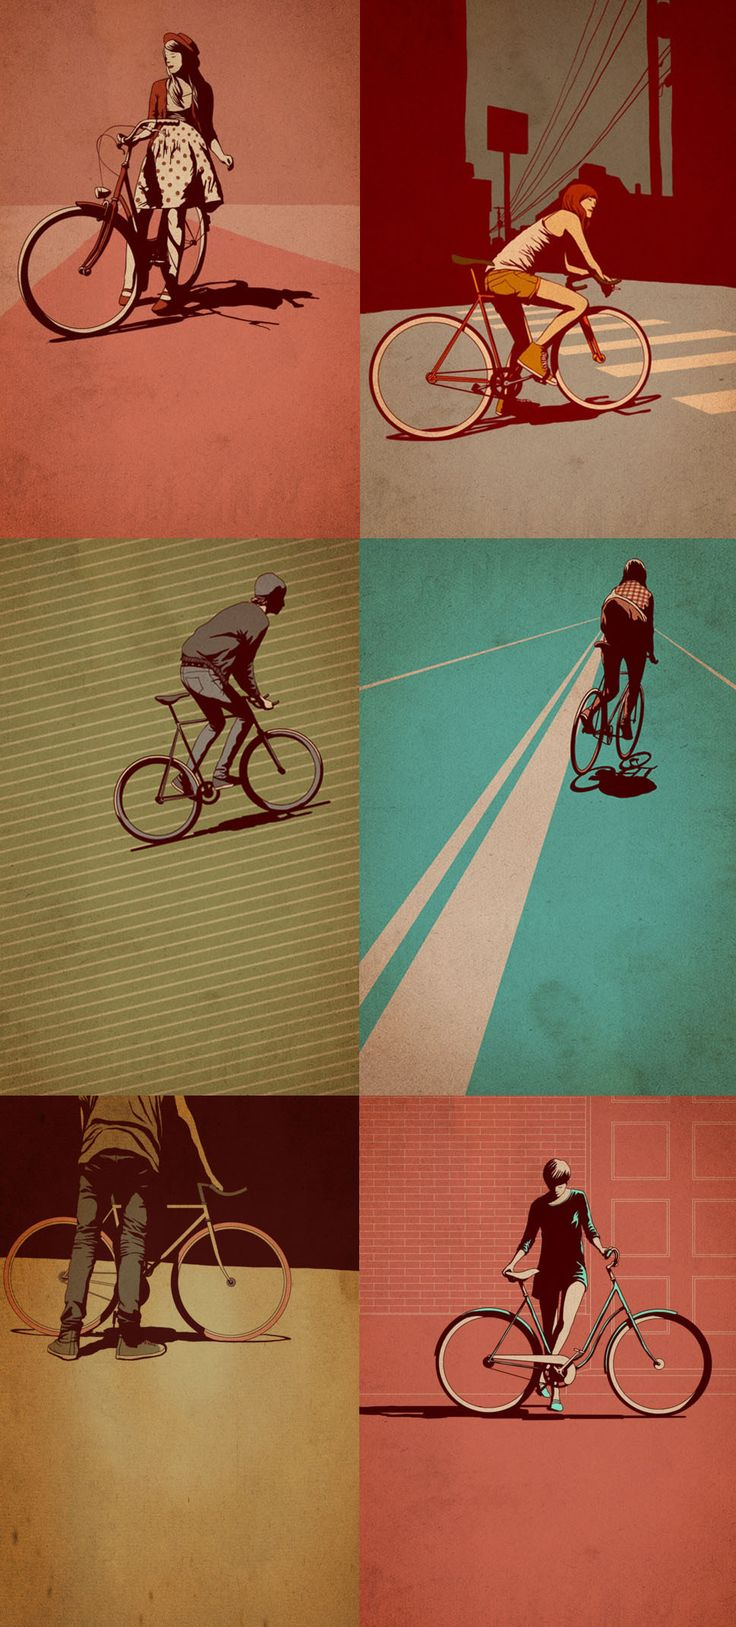 Bike illustrations by tumblr artist Adams Carvalho.